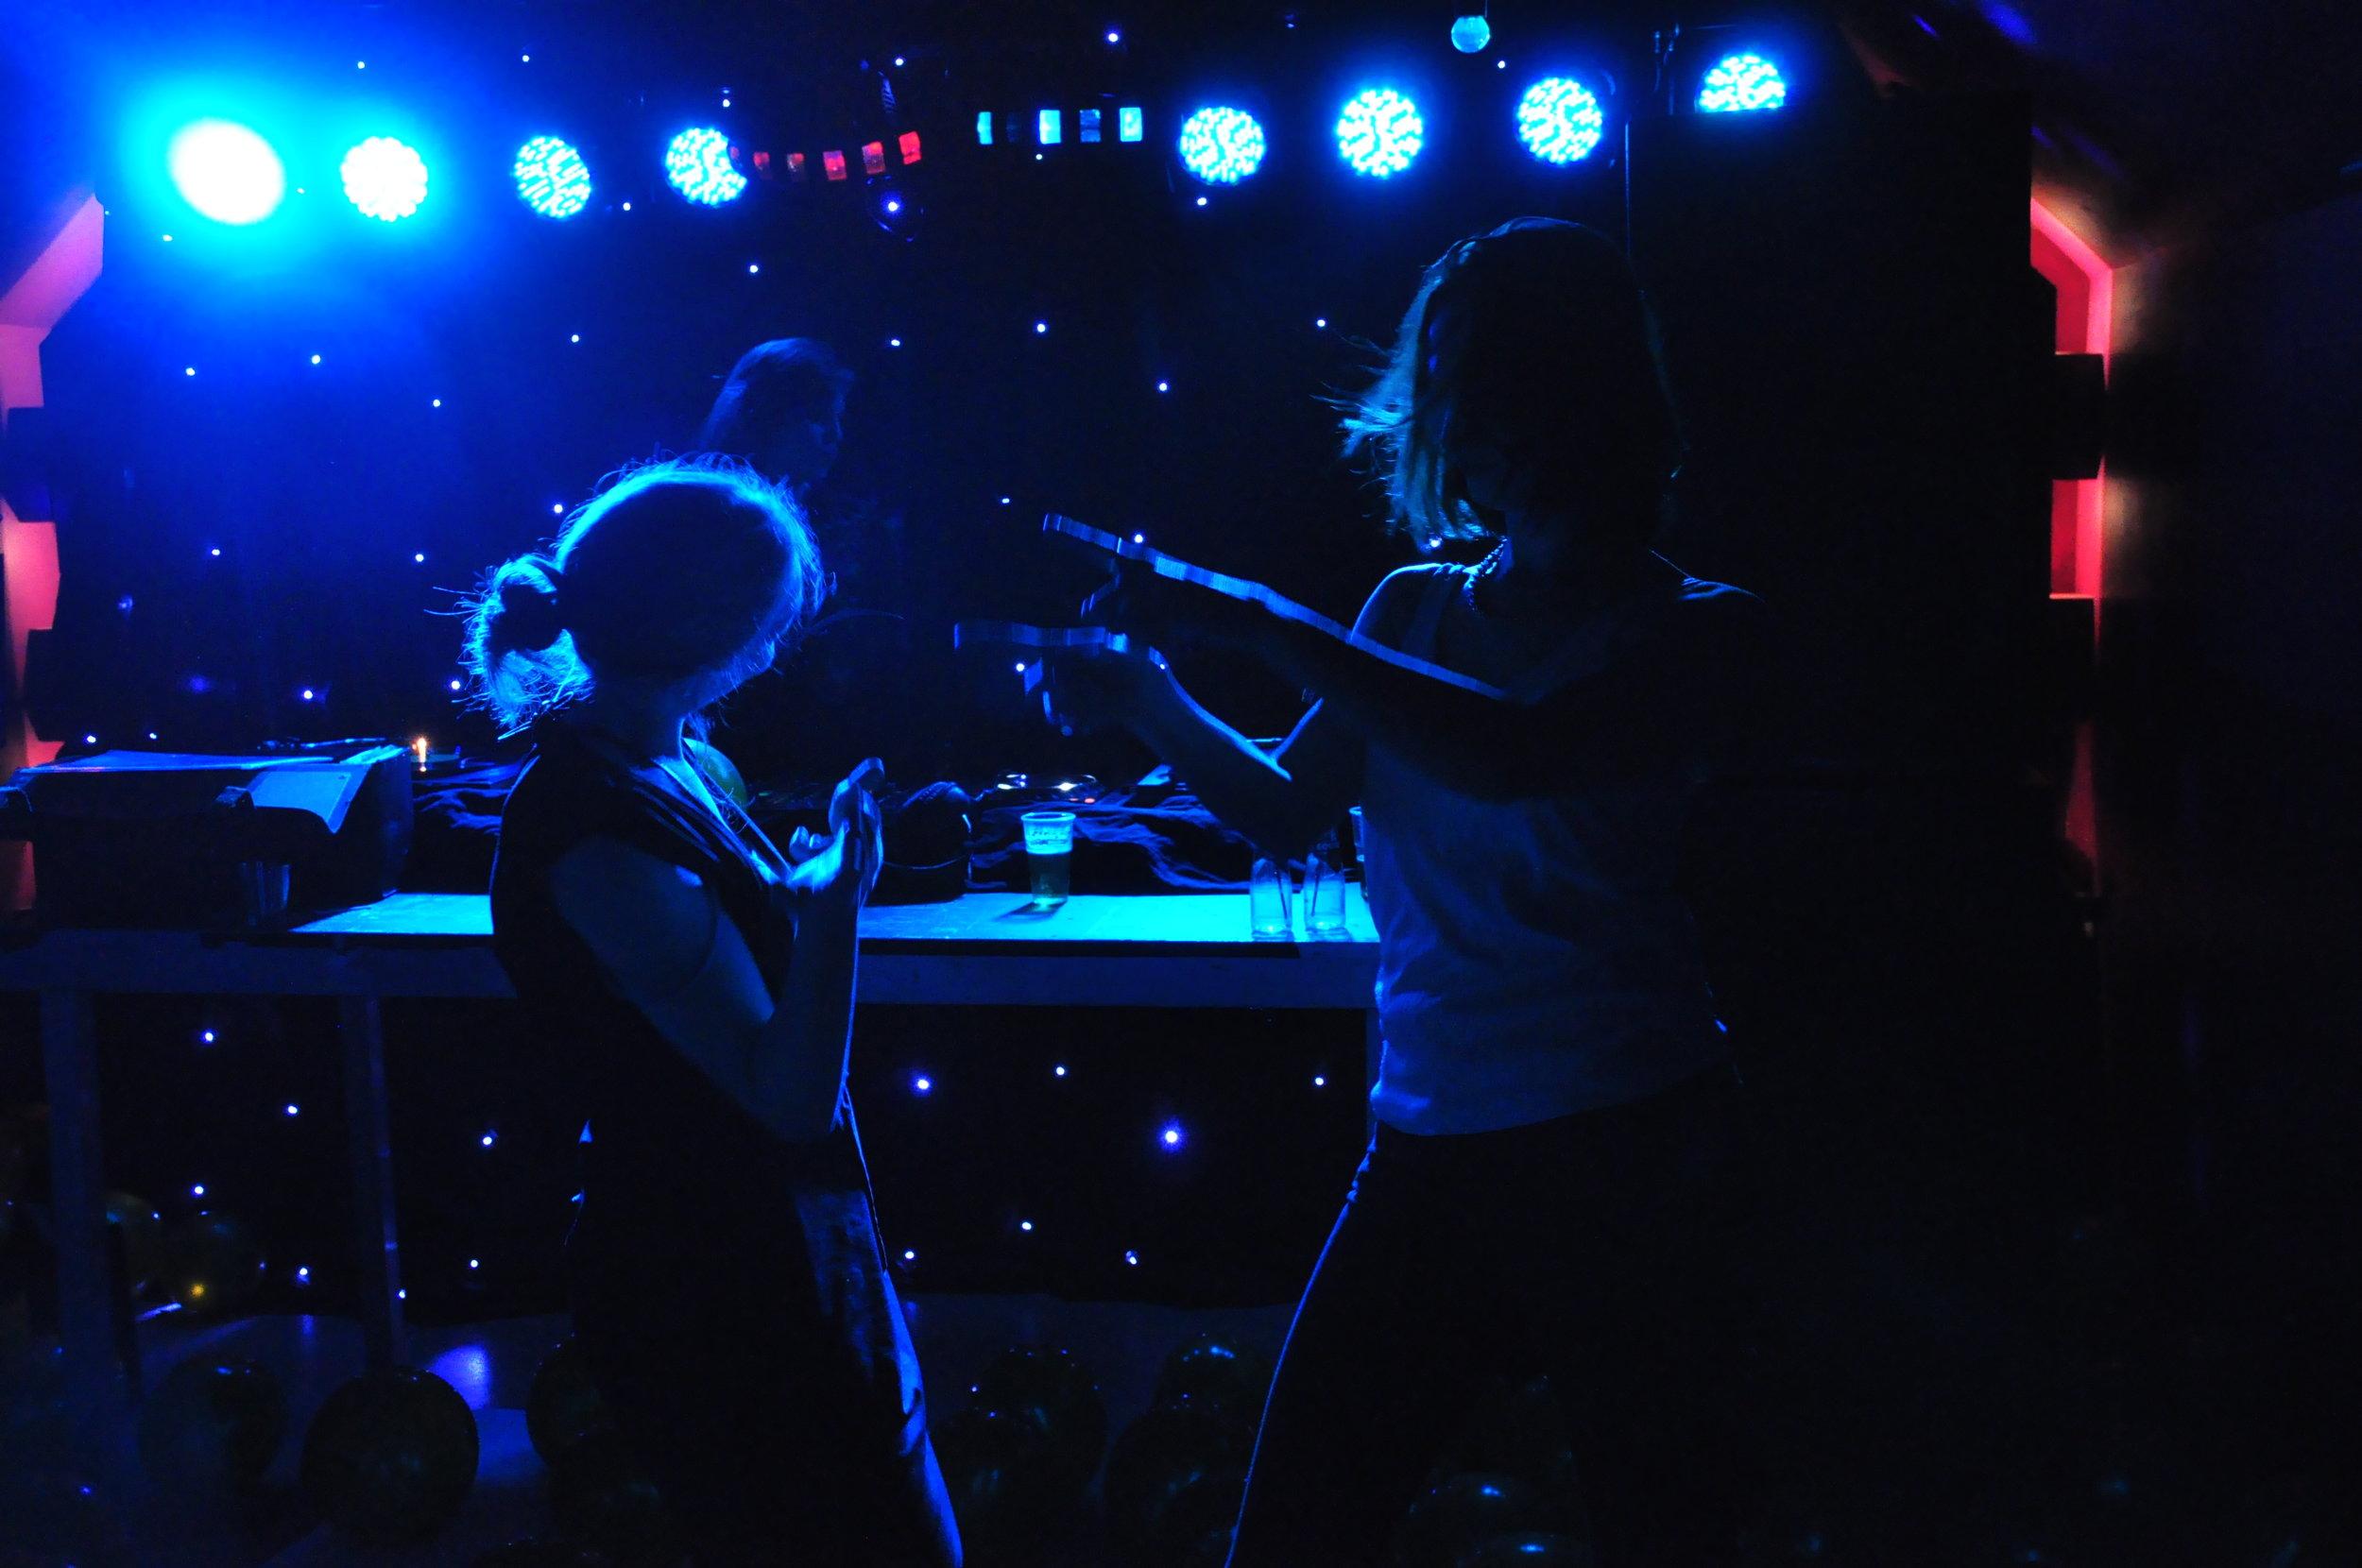 DJ Miss Trudy - vintage music vinyl rock n roll dj bruiloft evenement bedrijfsfeest dj personeelsfeest